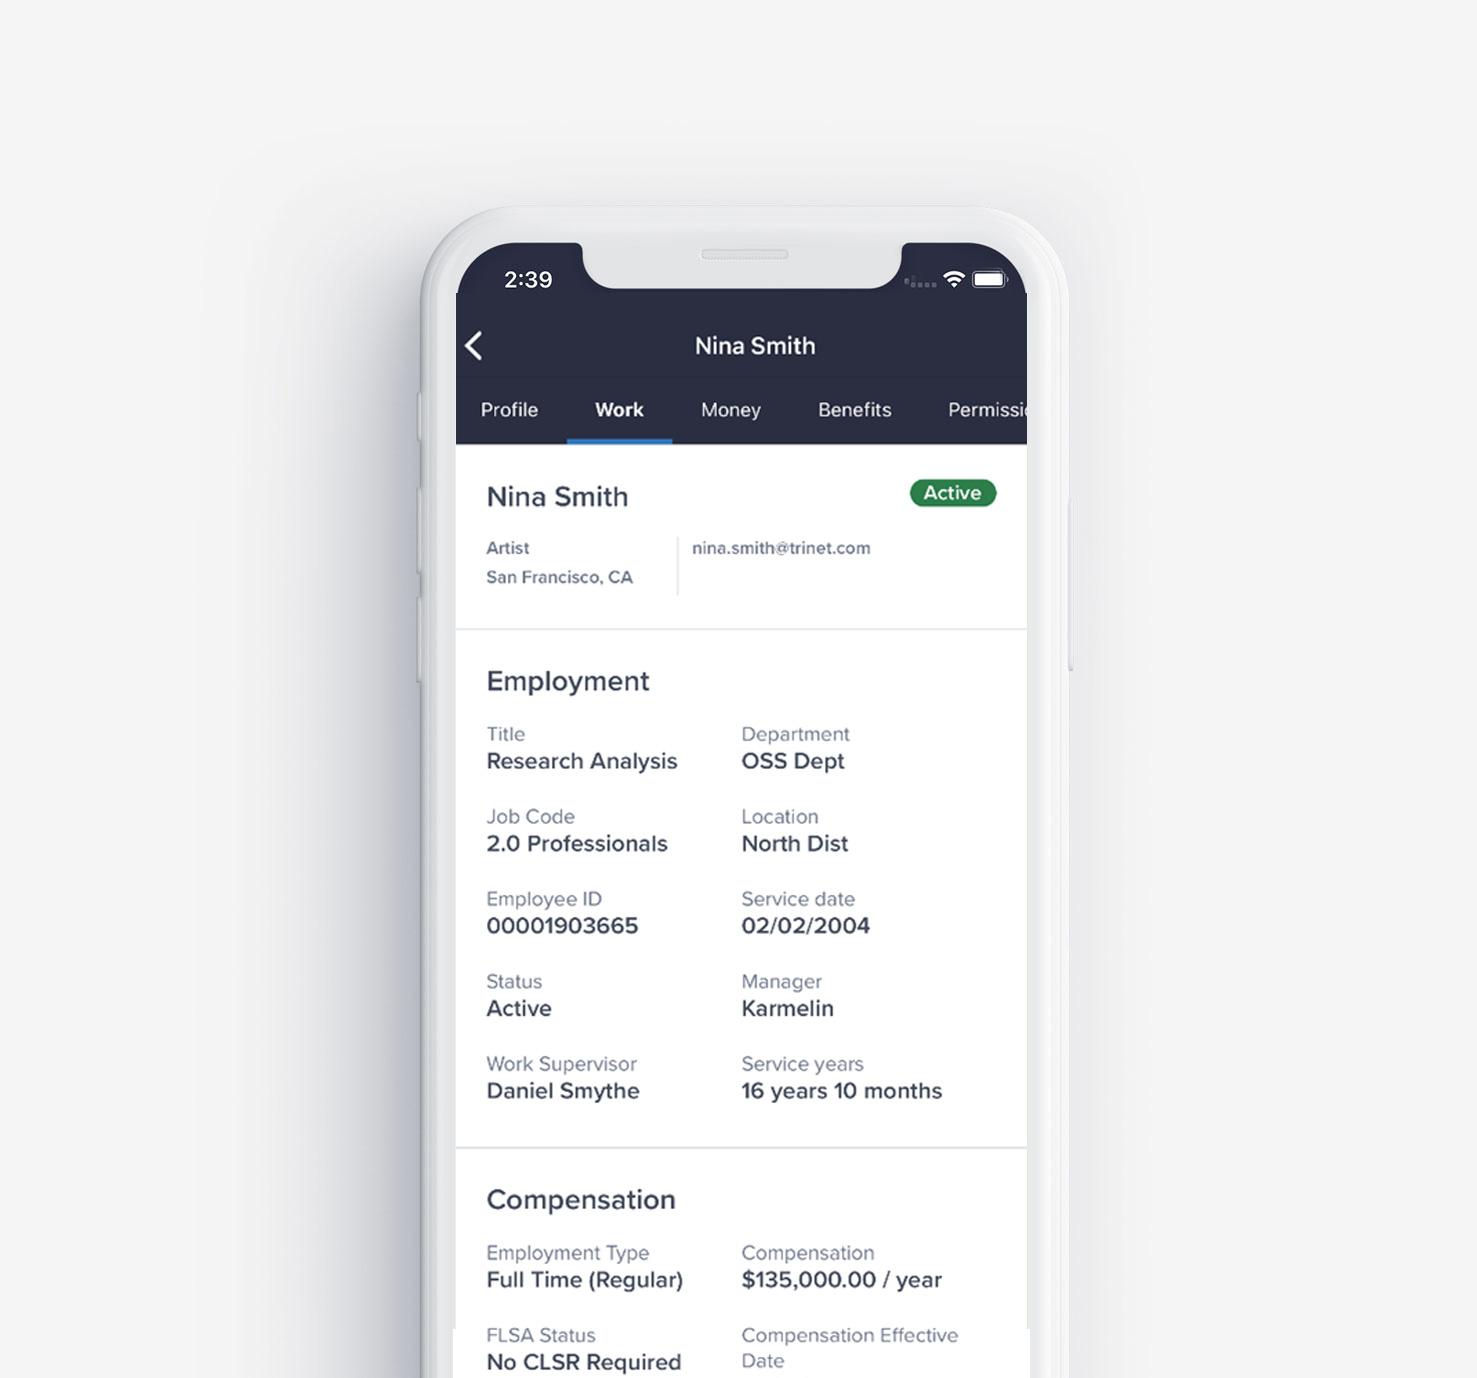 TriNet mobile app admin capabilities